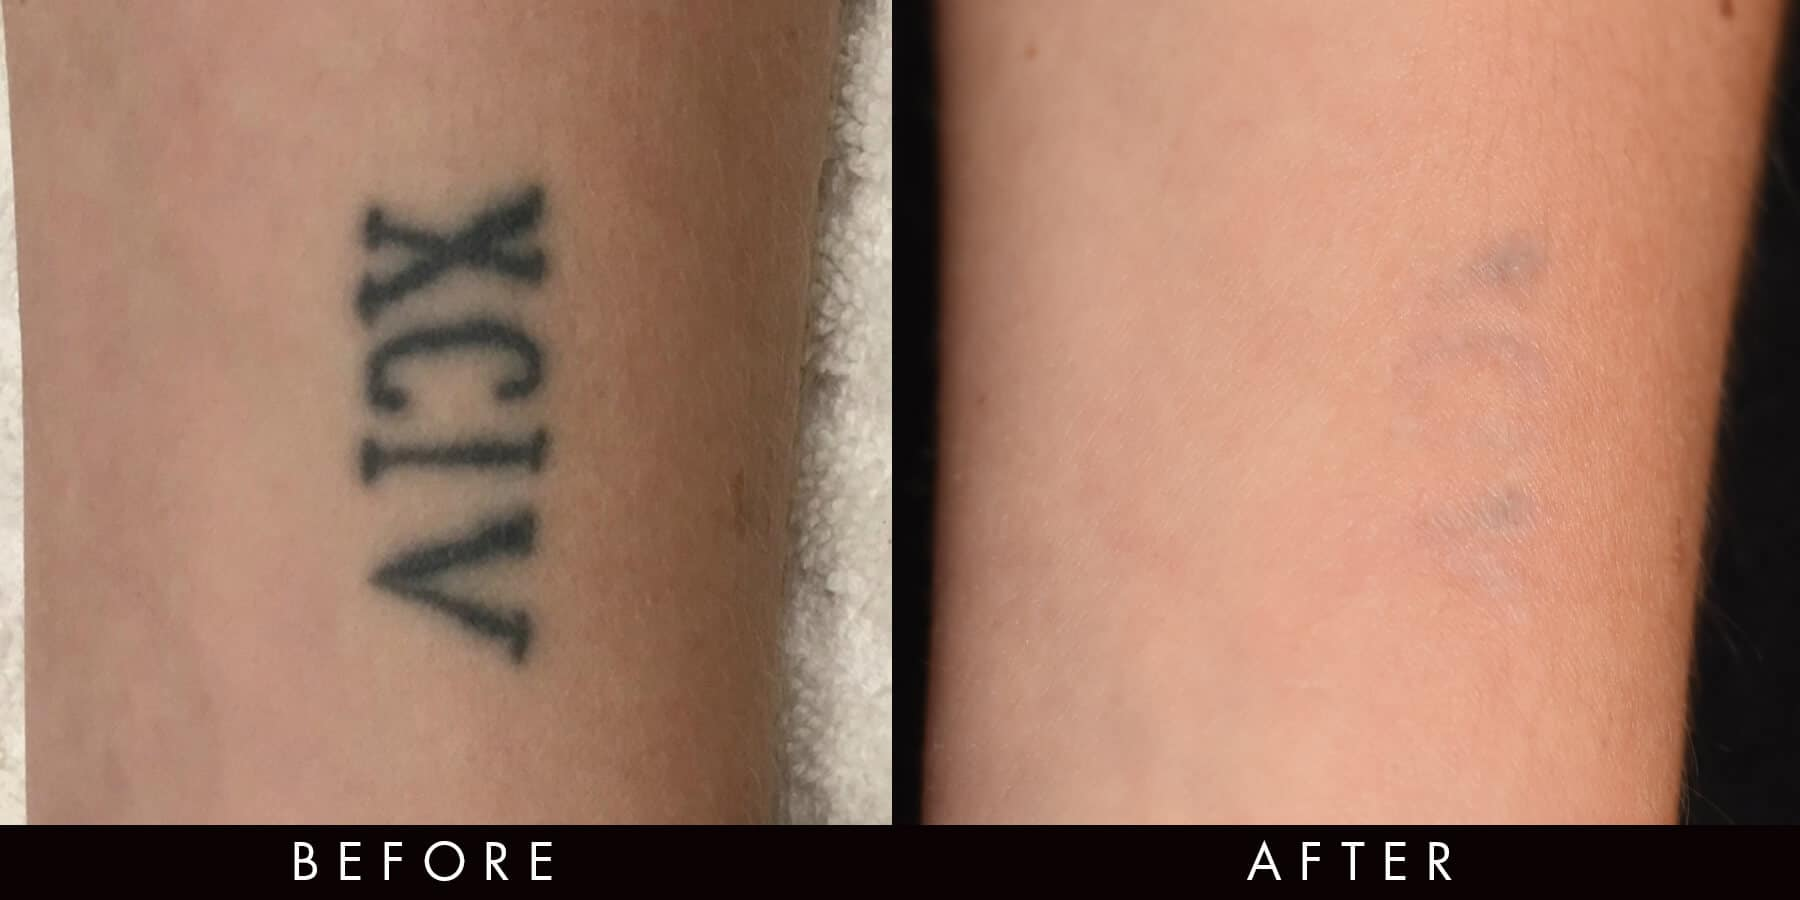 Tattoo Removal Treatments Picoway Newcastle